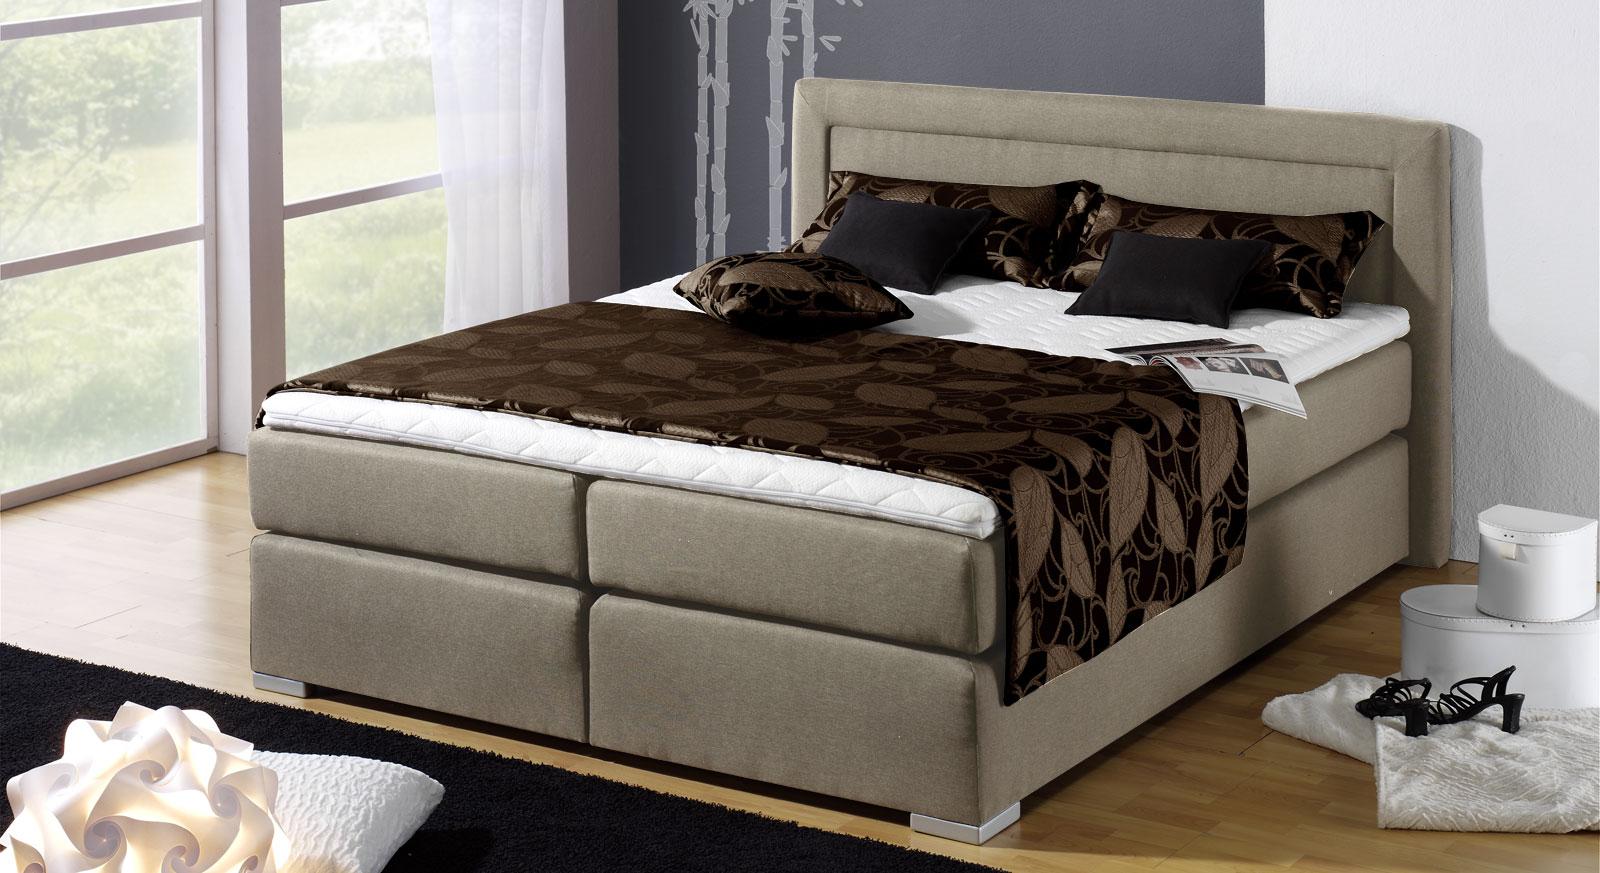 Full Size of Rustikales Bett Kaufen Selber Bauen Rustikal Rustikale Betten Gunstig 140x200 Aus Holz Bettgestell Holzbetten Massivholzbetten Mit Bettkasten Massivholz Bett Rustikales Bett